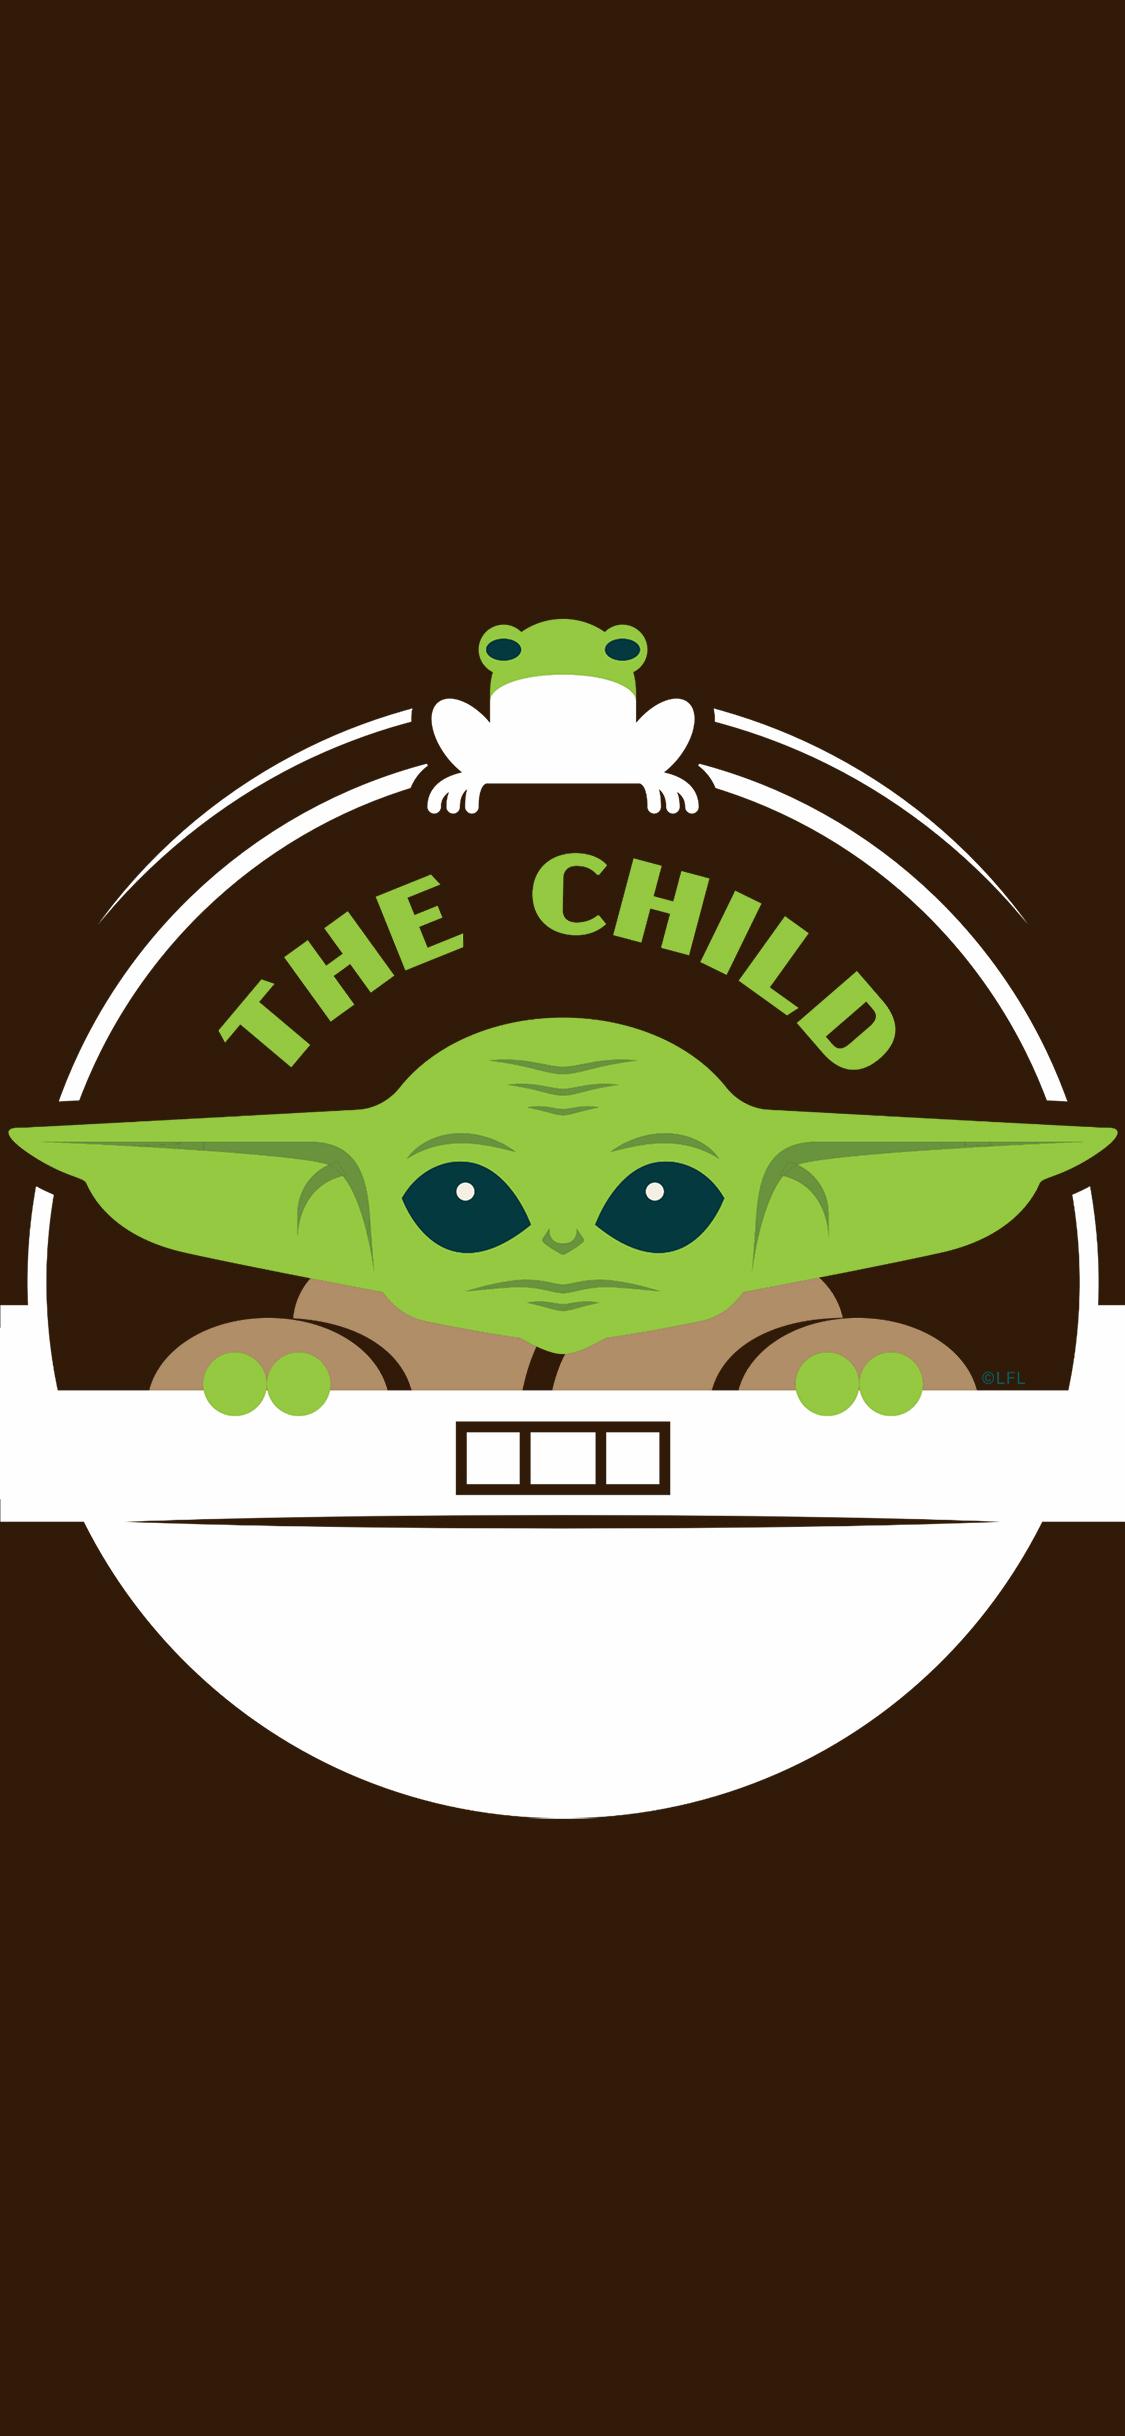 Baby Yoda Iphone X Wallpaper 1125x2436 Download Hd Wallpaper Wallpapertip